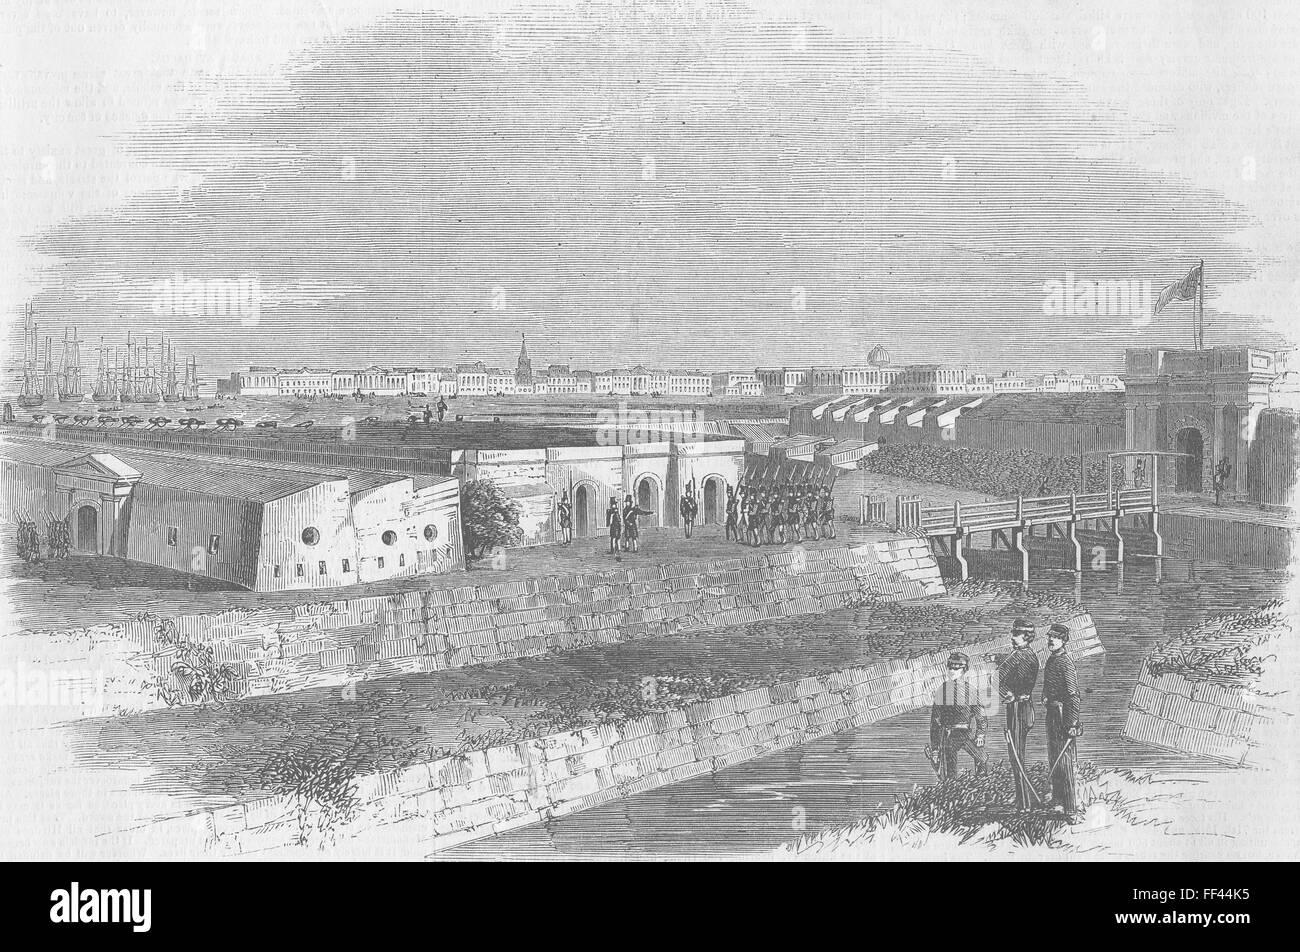 INDIA Ft William-Kolkata 1857  Illustrated London News Stock